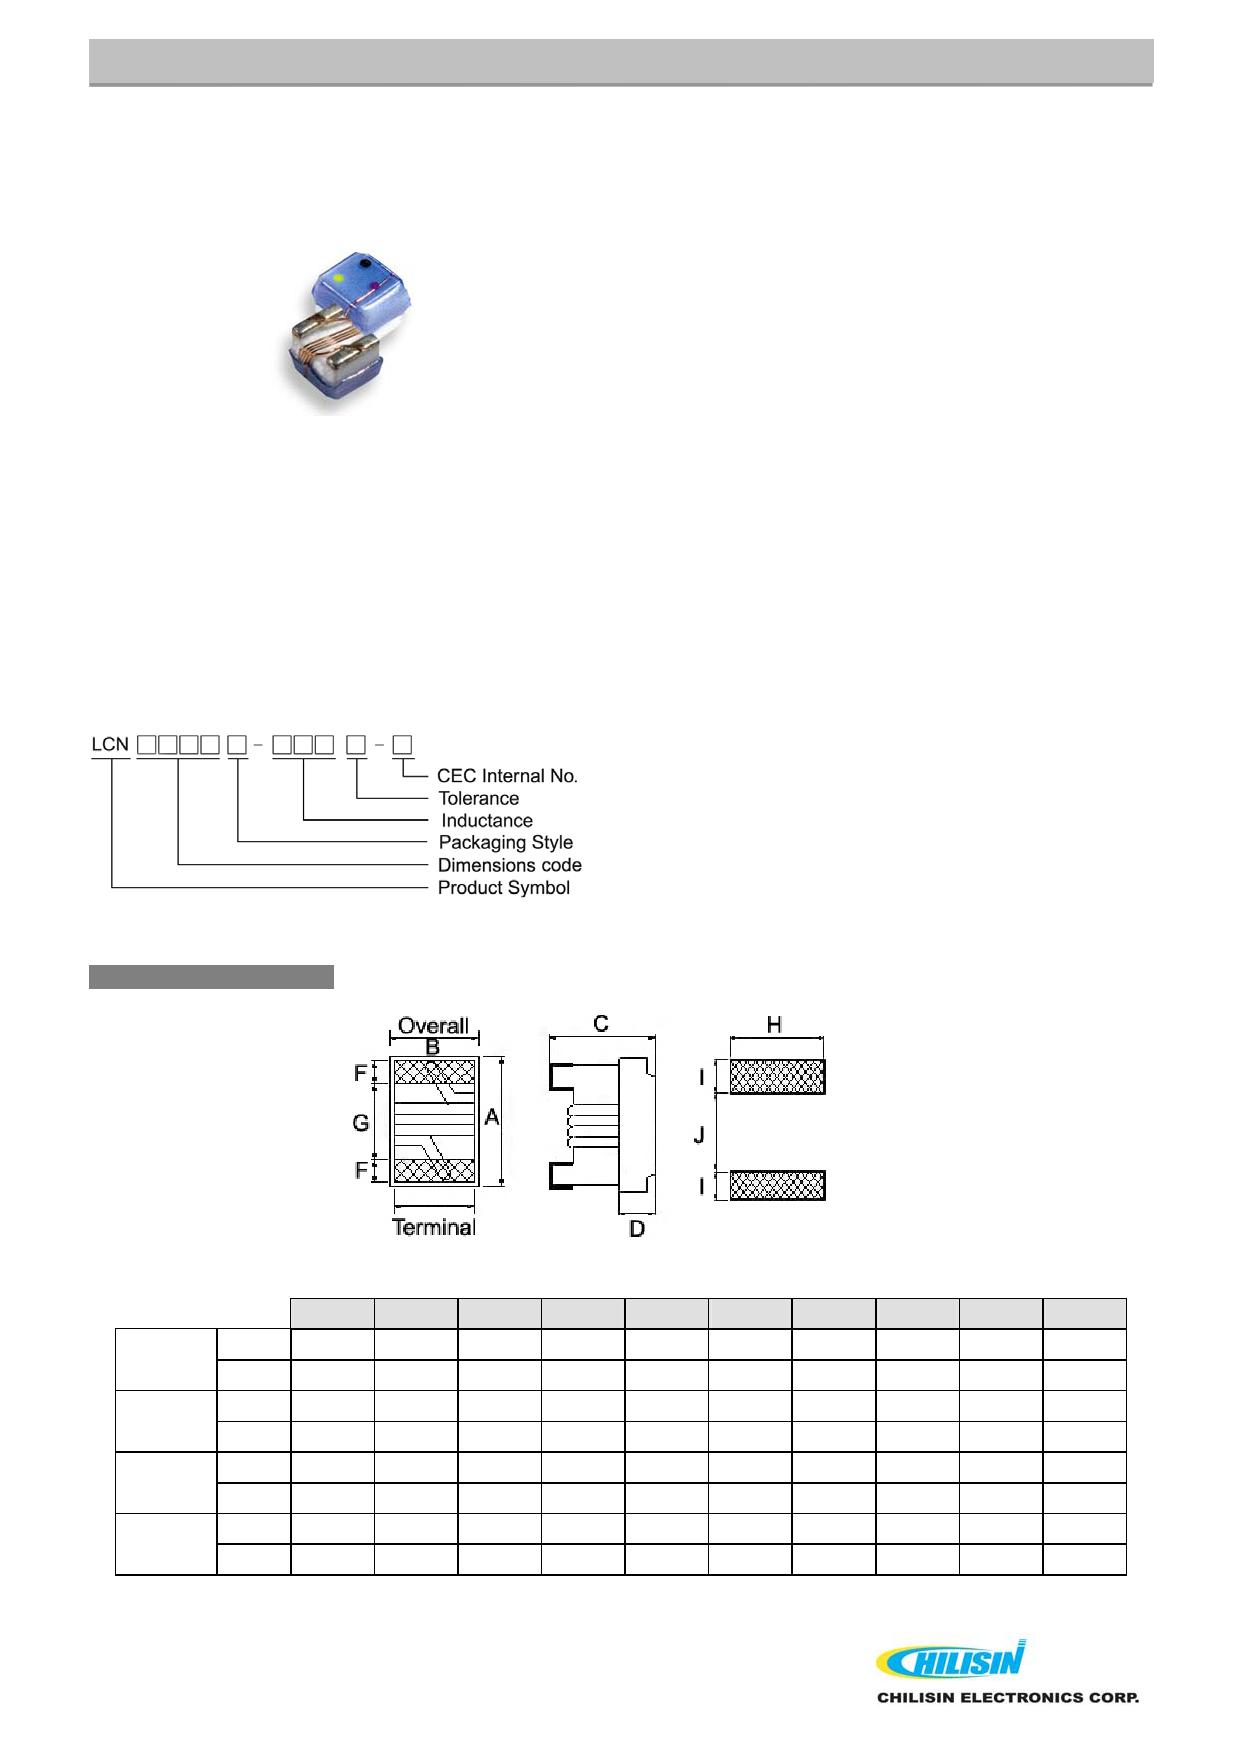 LCN0805 데이터시트 및 LCN0805 PDF